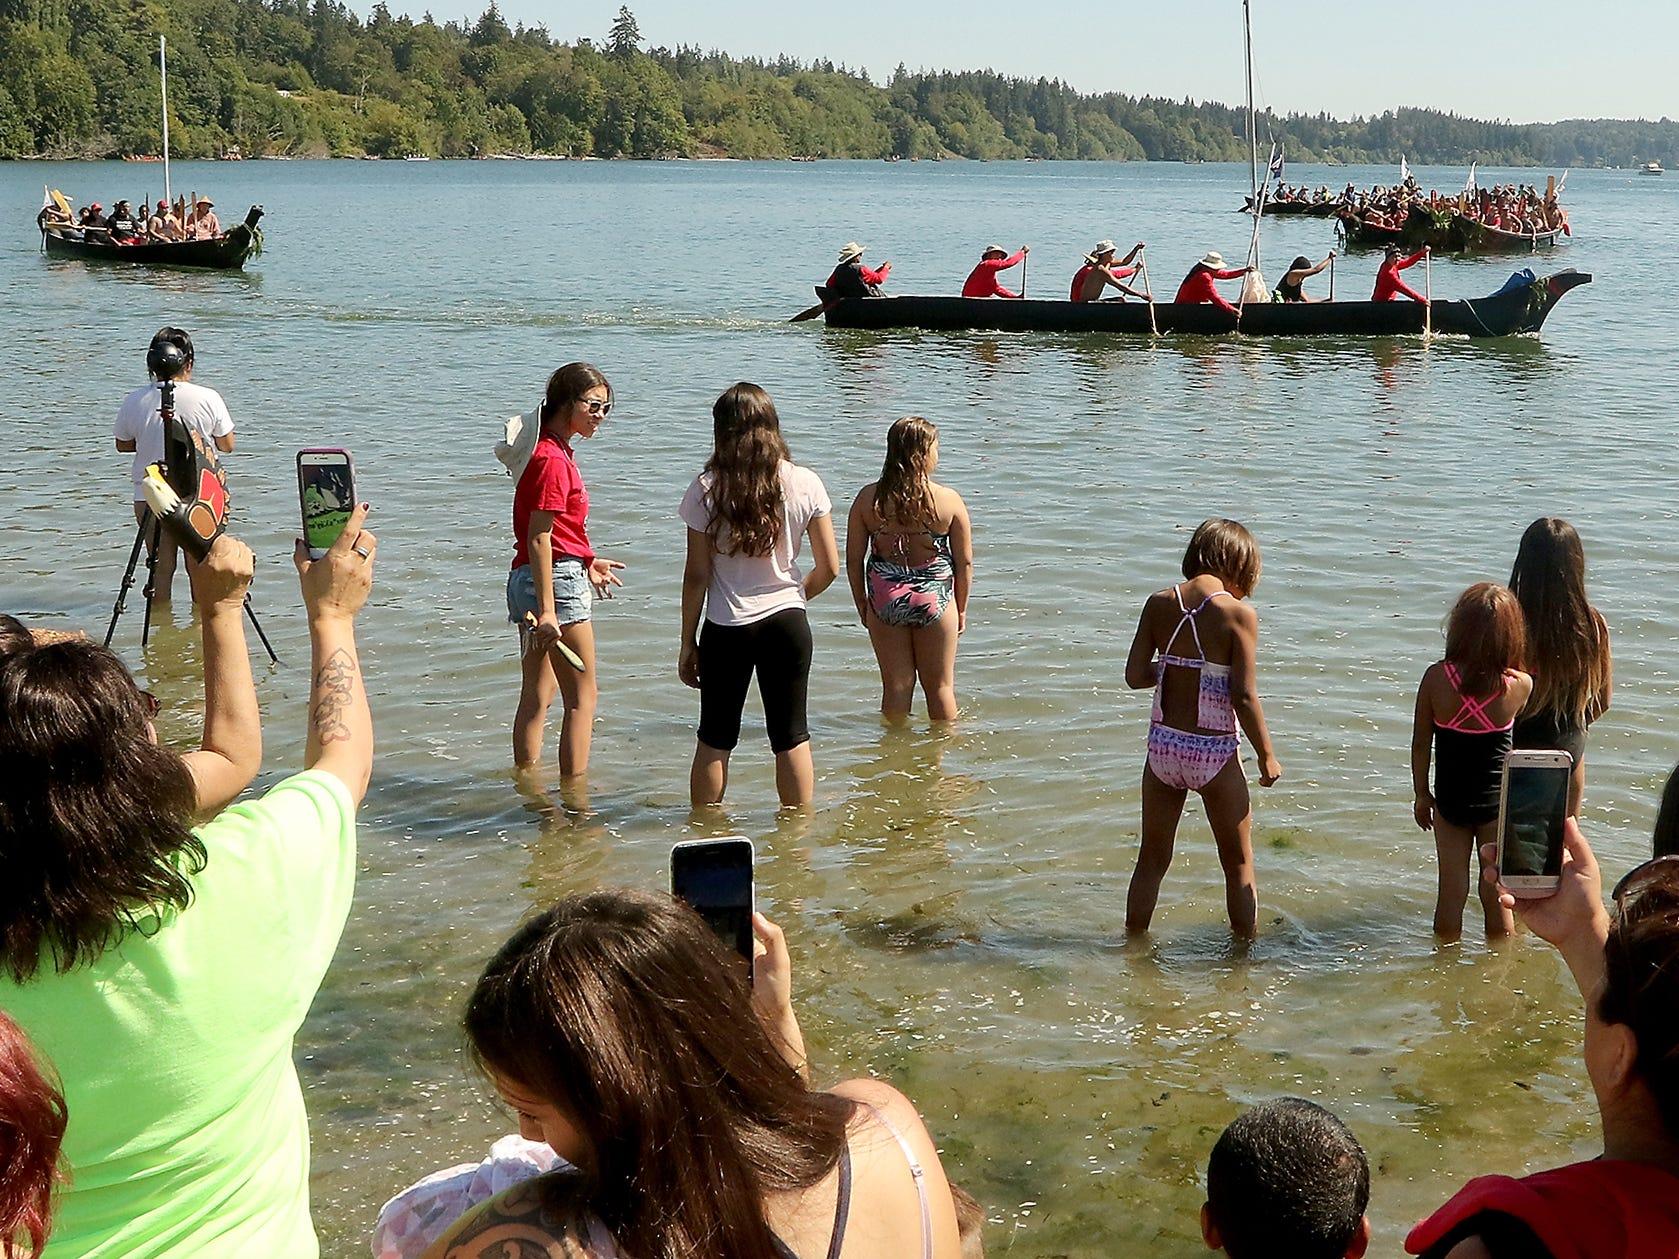 Tribal Canoe Journey ÒPaddle to PuyallupÓ canoes parade past those on shore of Point Julia on Tuesday, July 24, 2018.